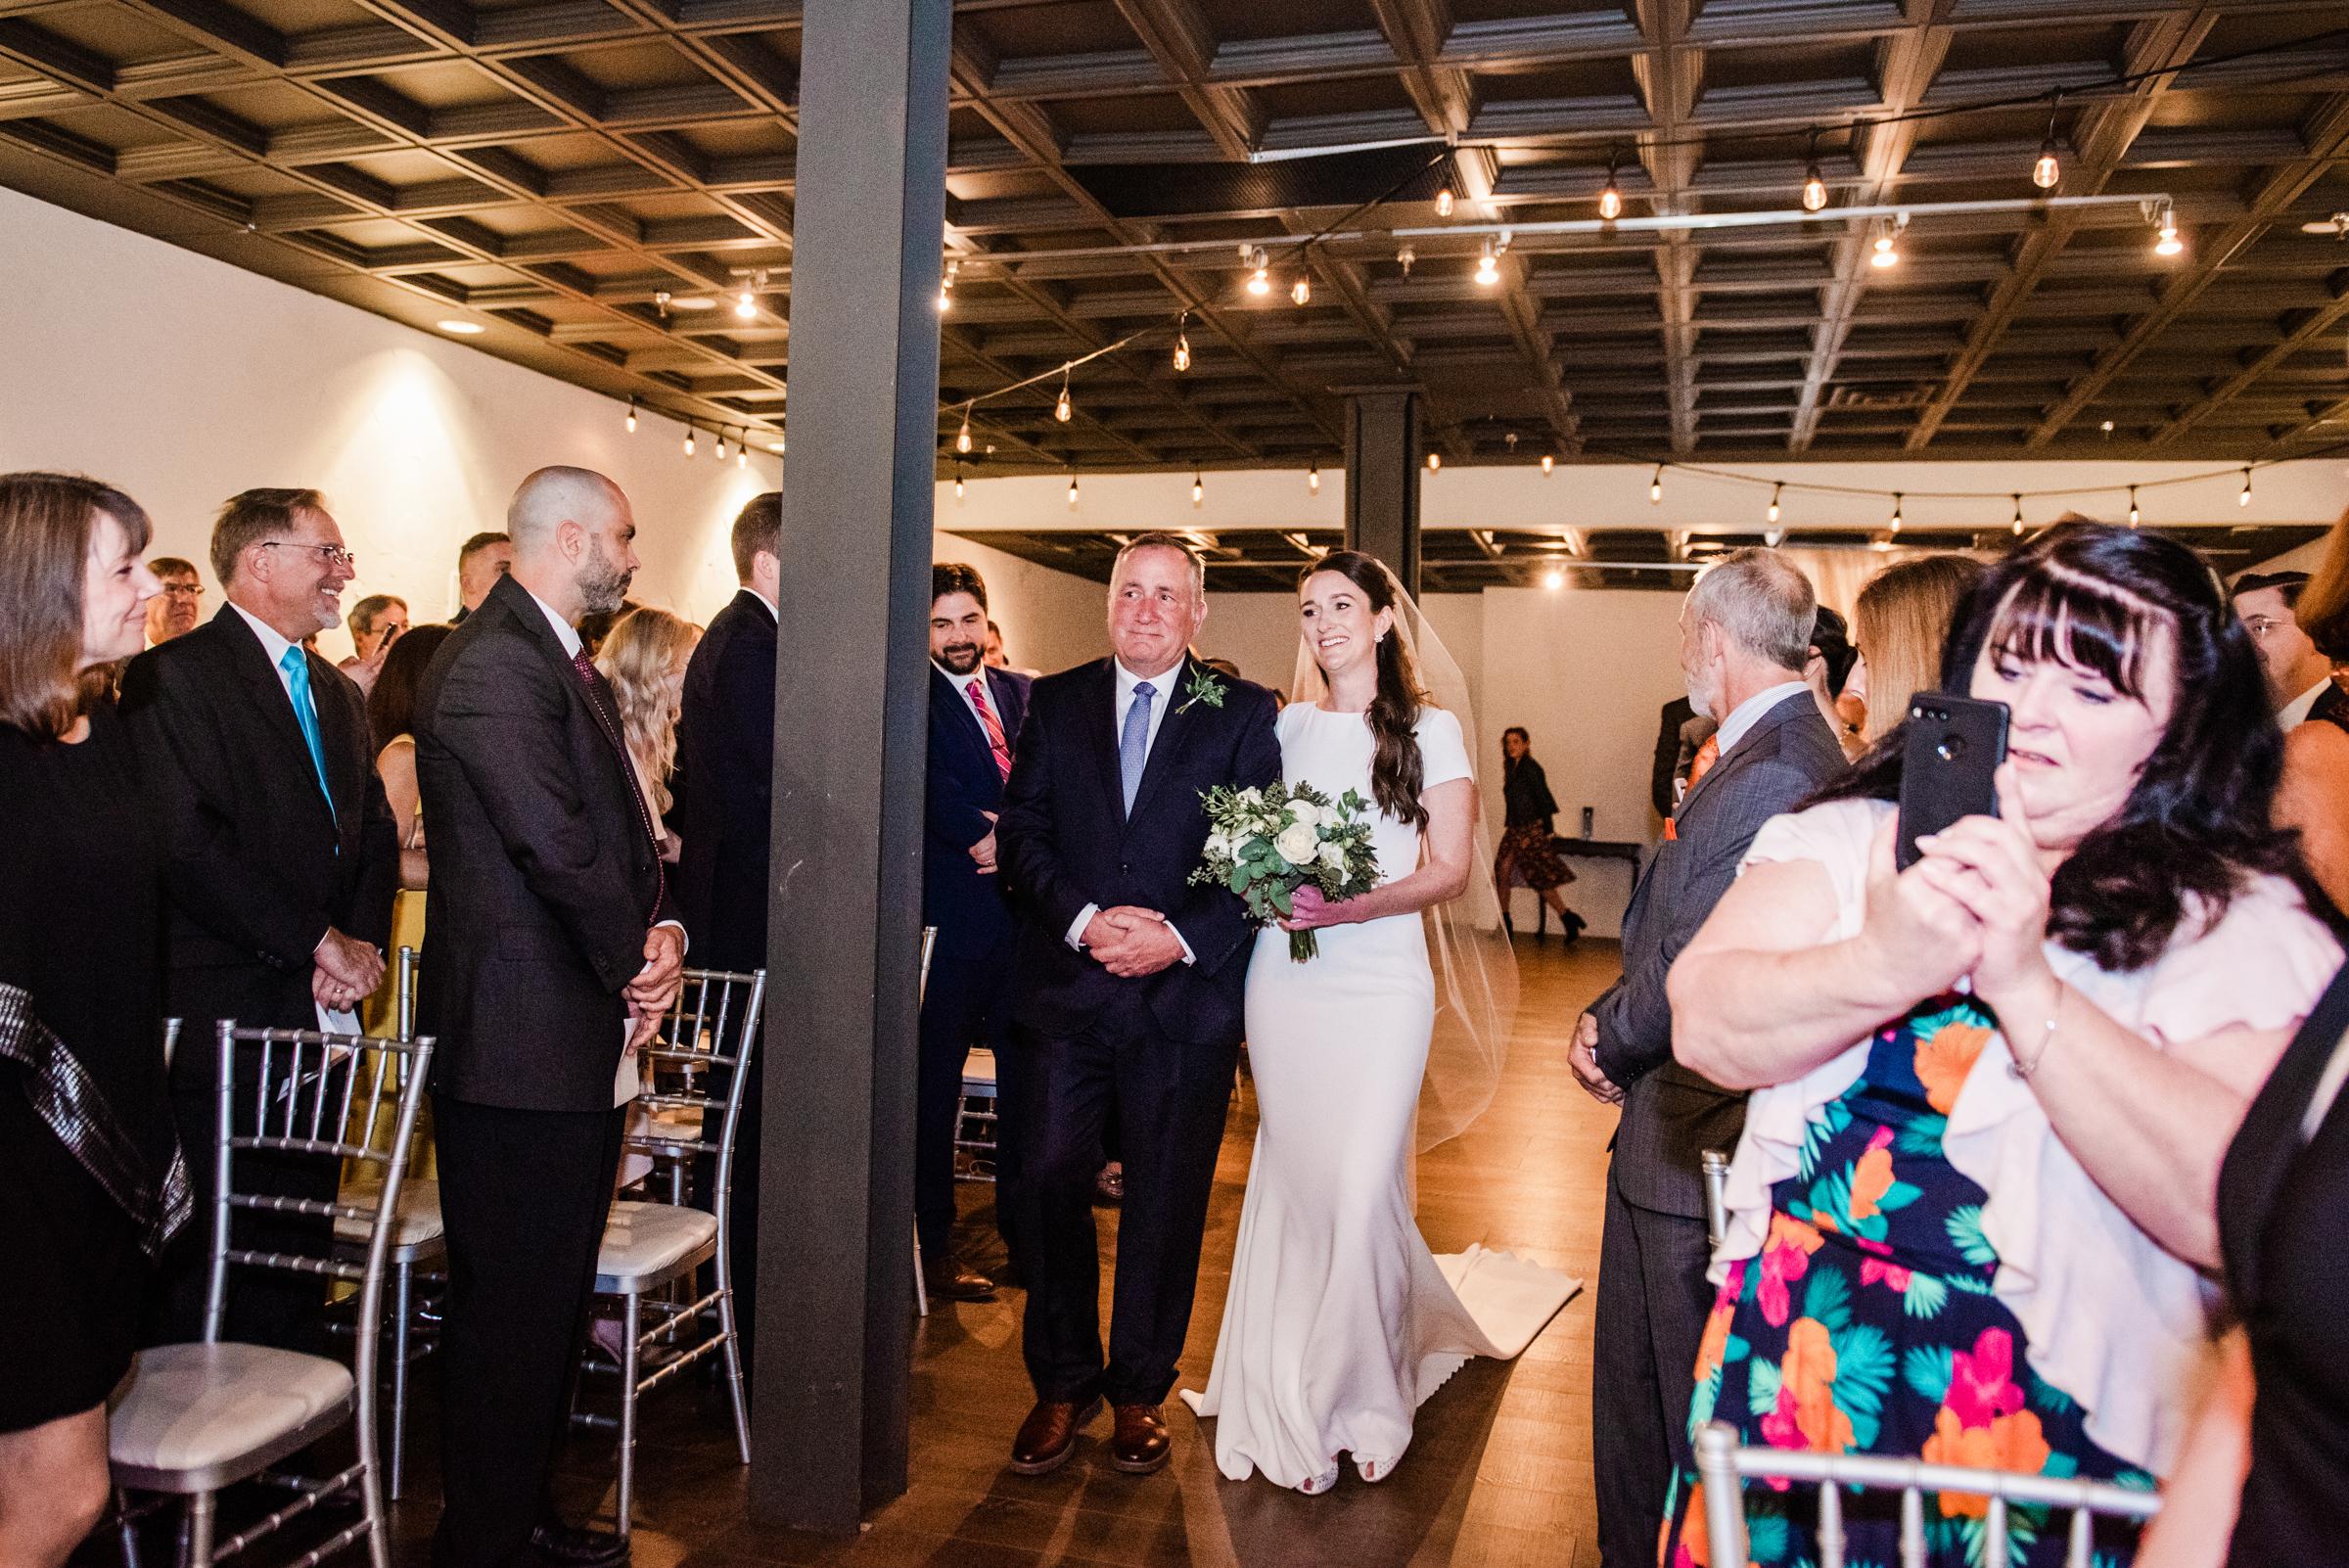 SKY_Armory_Syracuse_Wedding_JILL_STUDIO_Rochester_NY_Photographer_DSC_5855.jpg